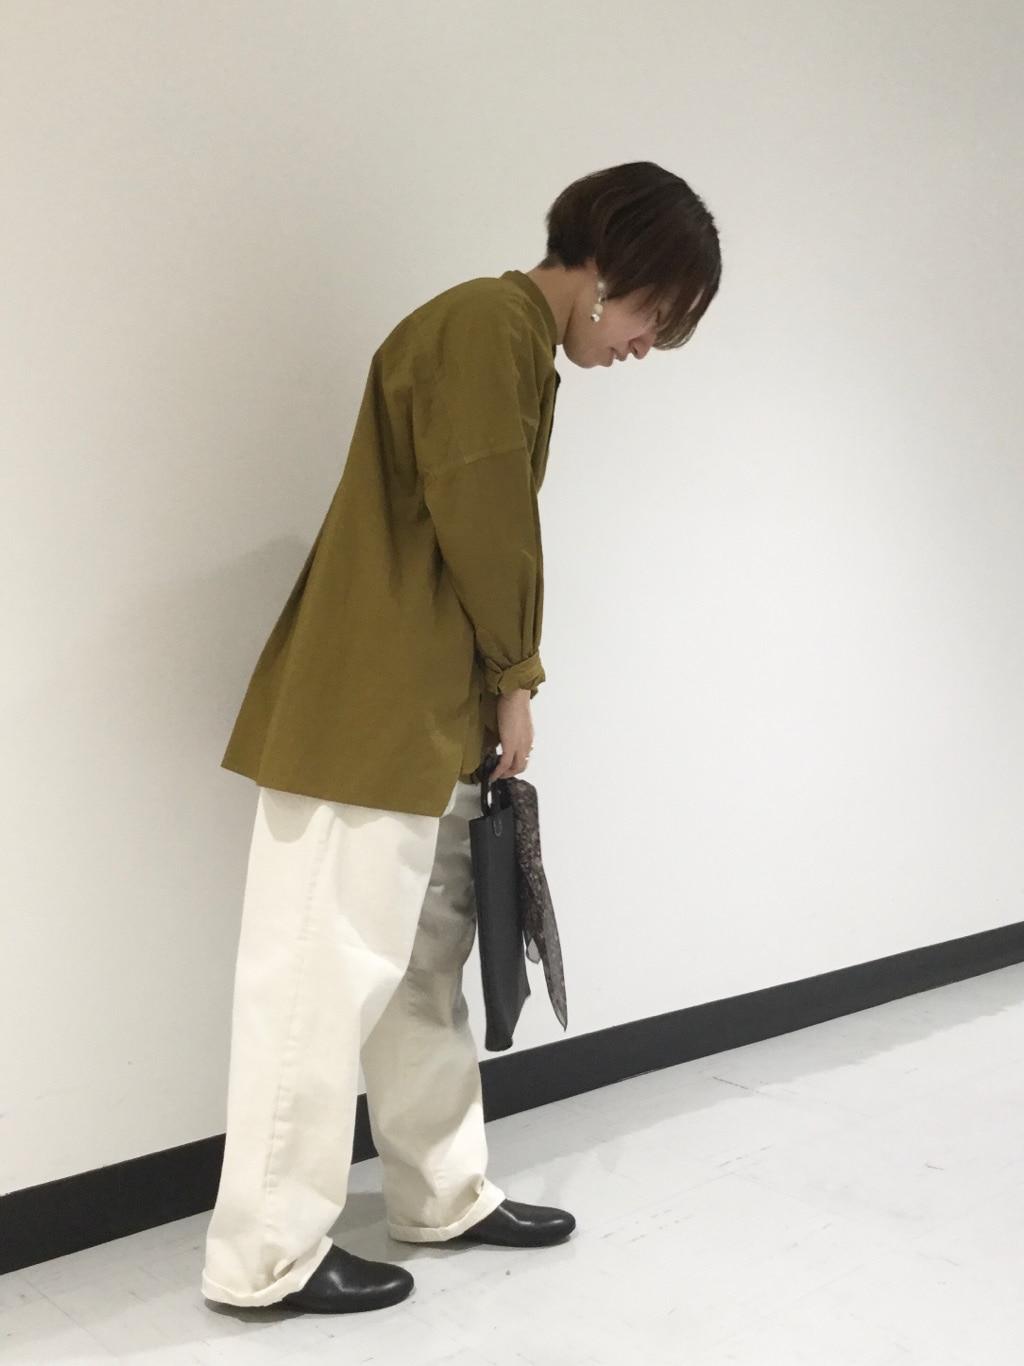 bulle de savon なんばシティ 身長:148cm 2020.03.14